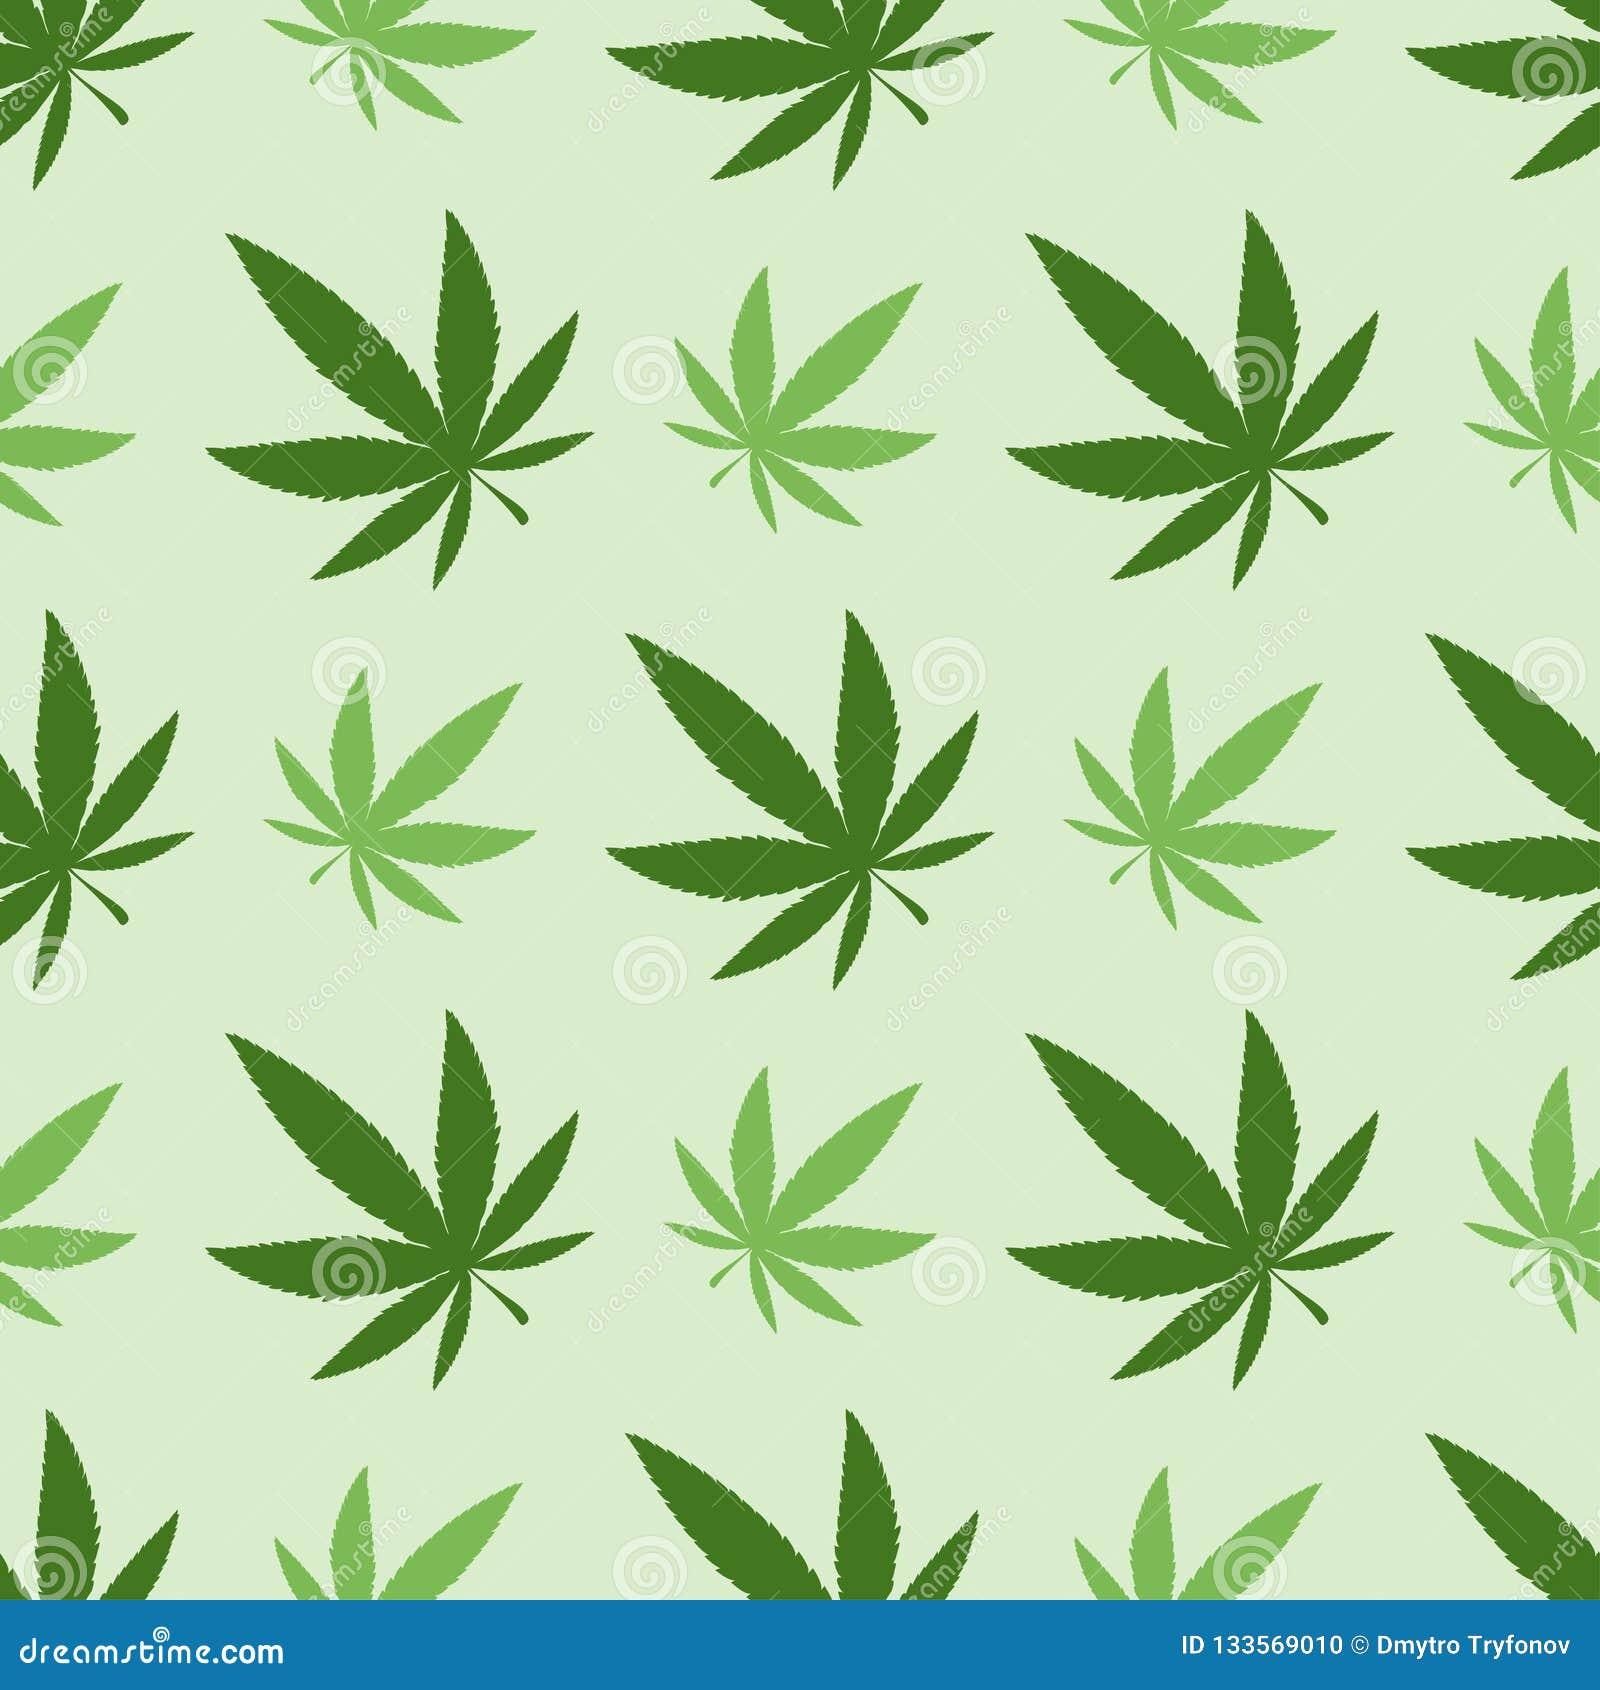 Марихуана бумага марихуана в тени